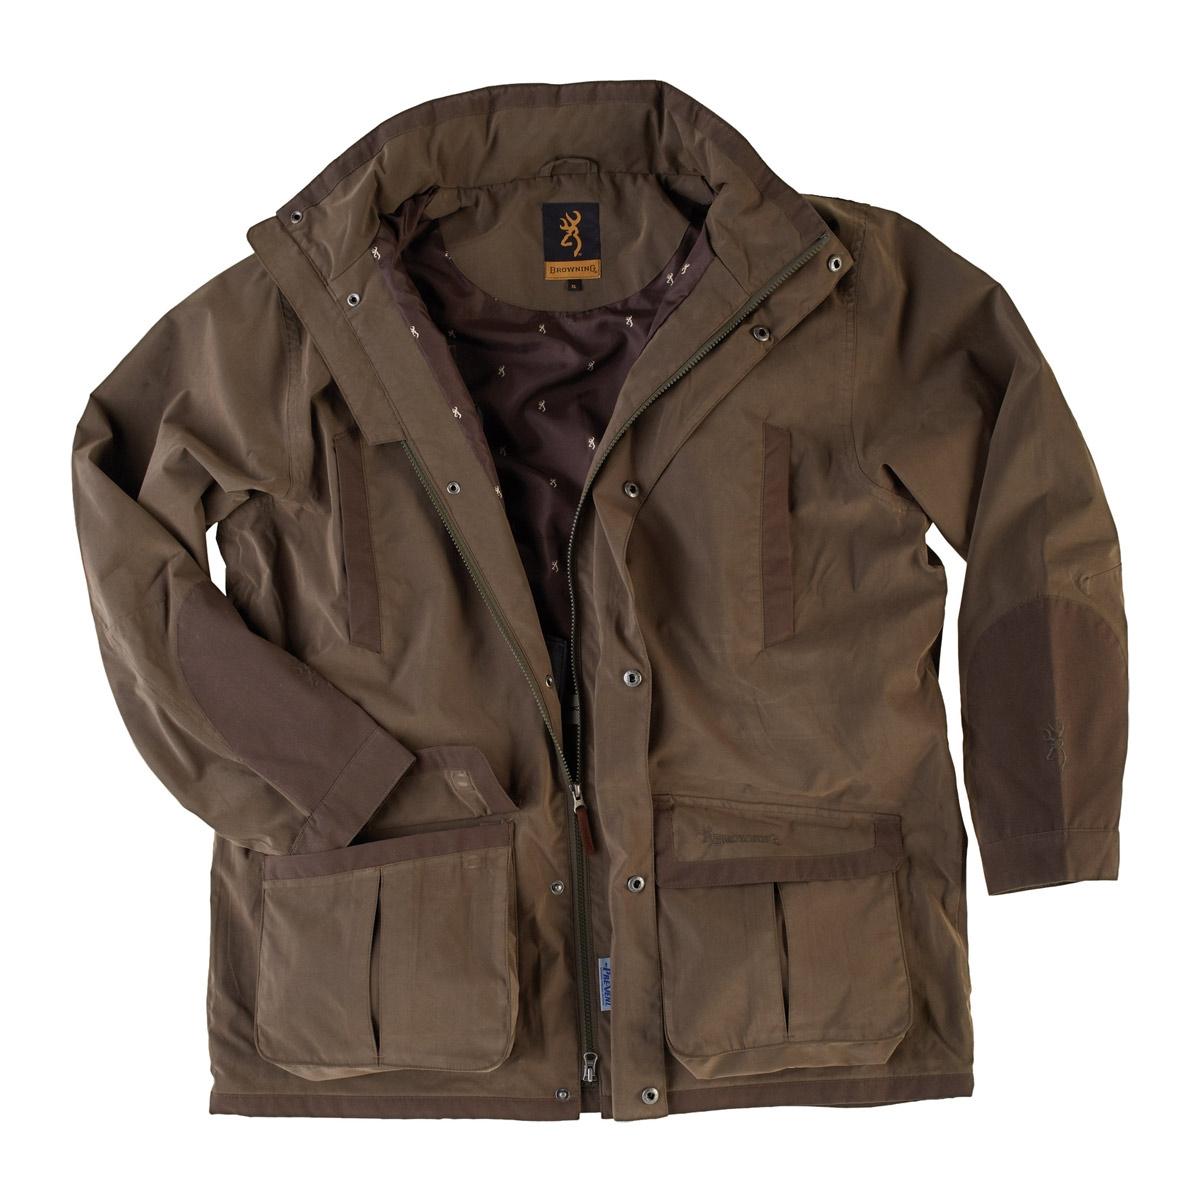 Browning Upland Hunter 2 Parka Jacket - Green | Uttings.co.uk